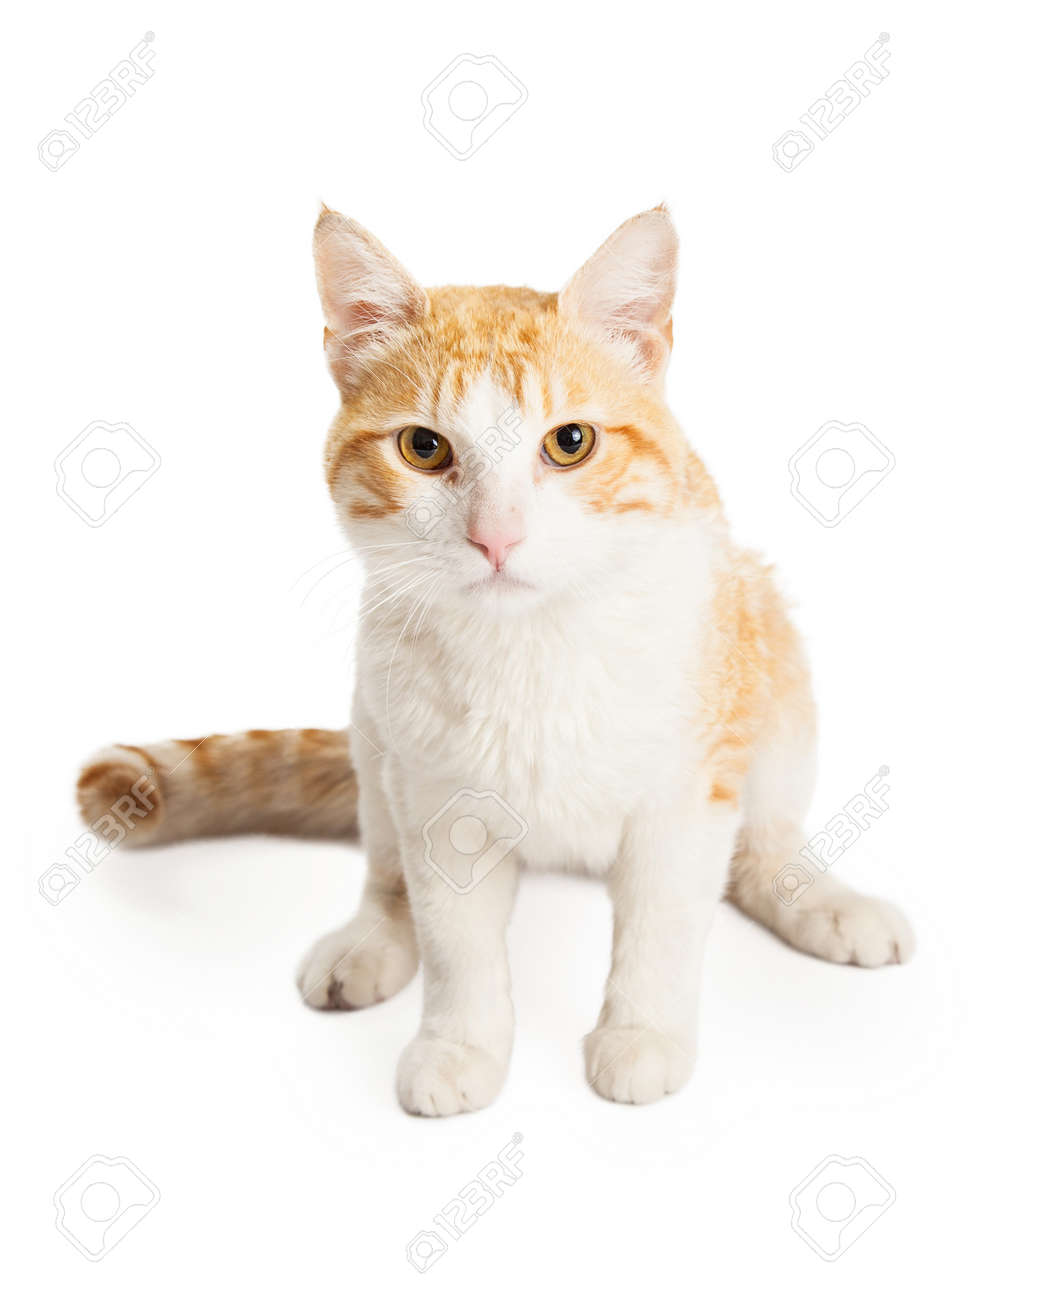 Gato naranja pelo corto